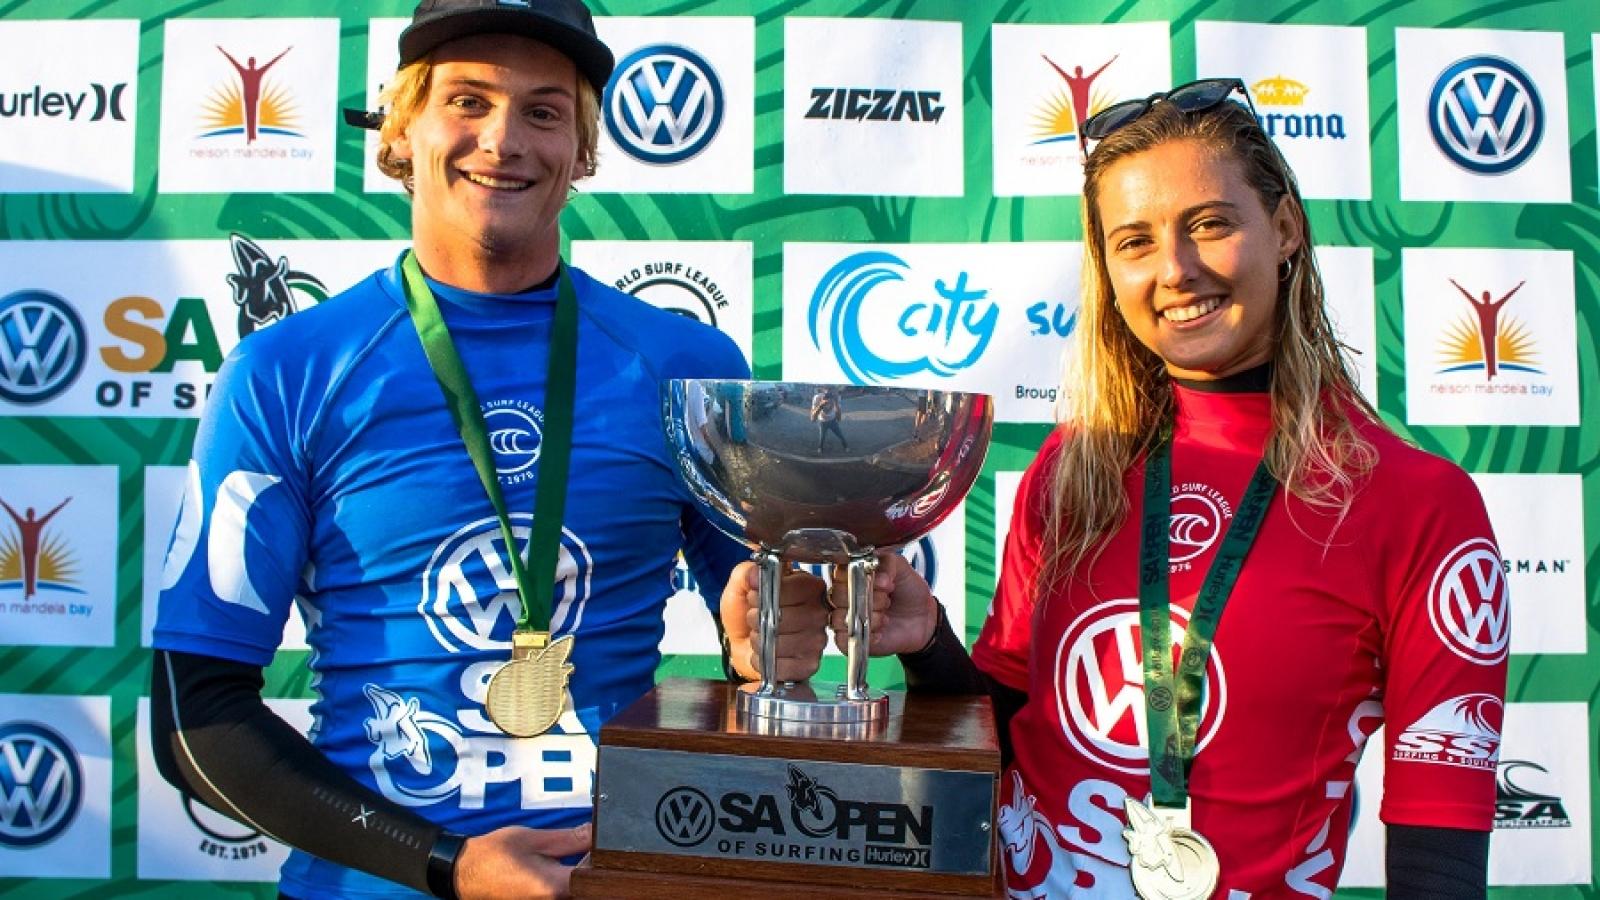 Volkwagen SA Open Of Surfing_Ian Thurtell_ Mens and Women winners - Copy